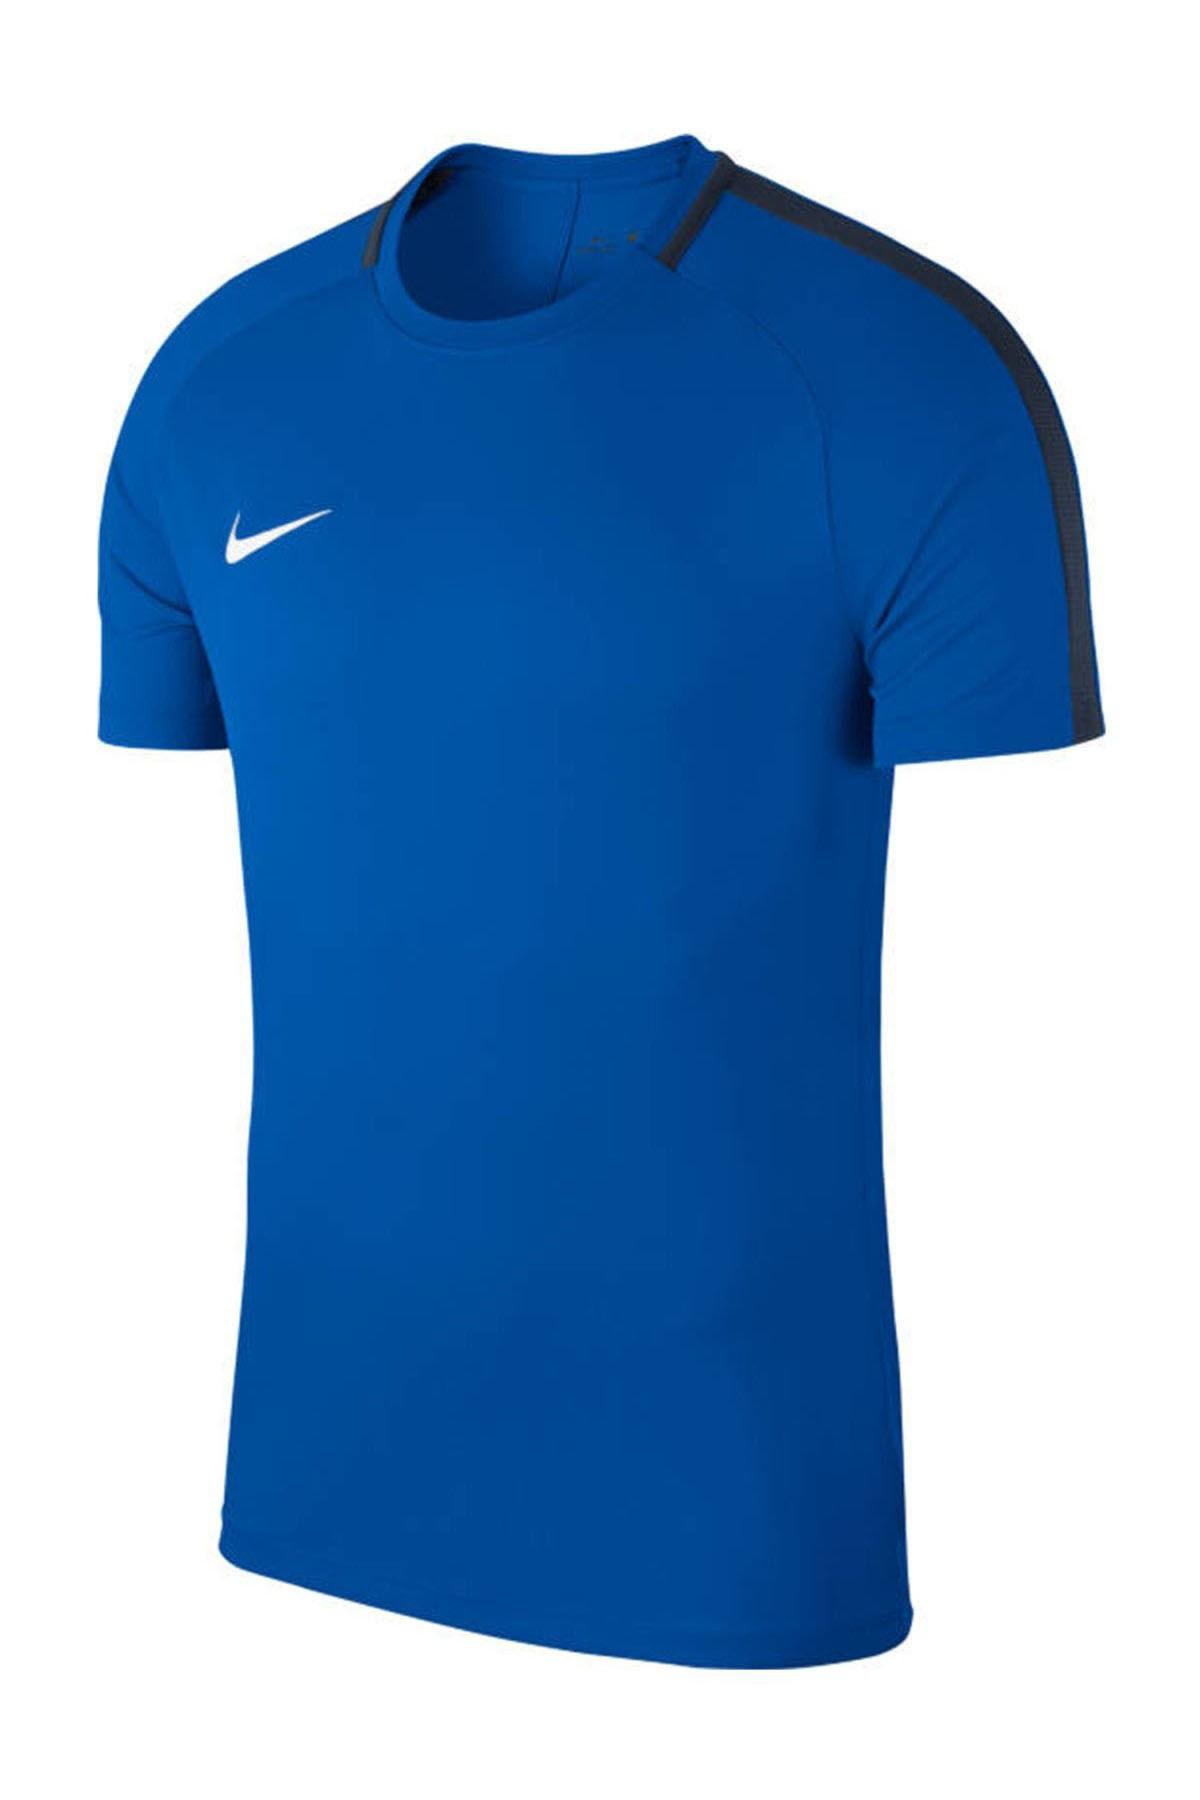 Nike Erkek T-shirt M Nk Dry Acdmy18 Top Ss 893693-463 1